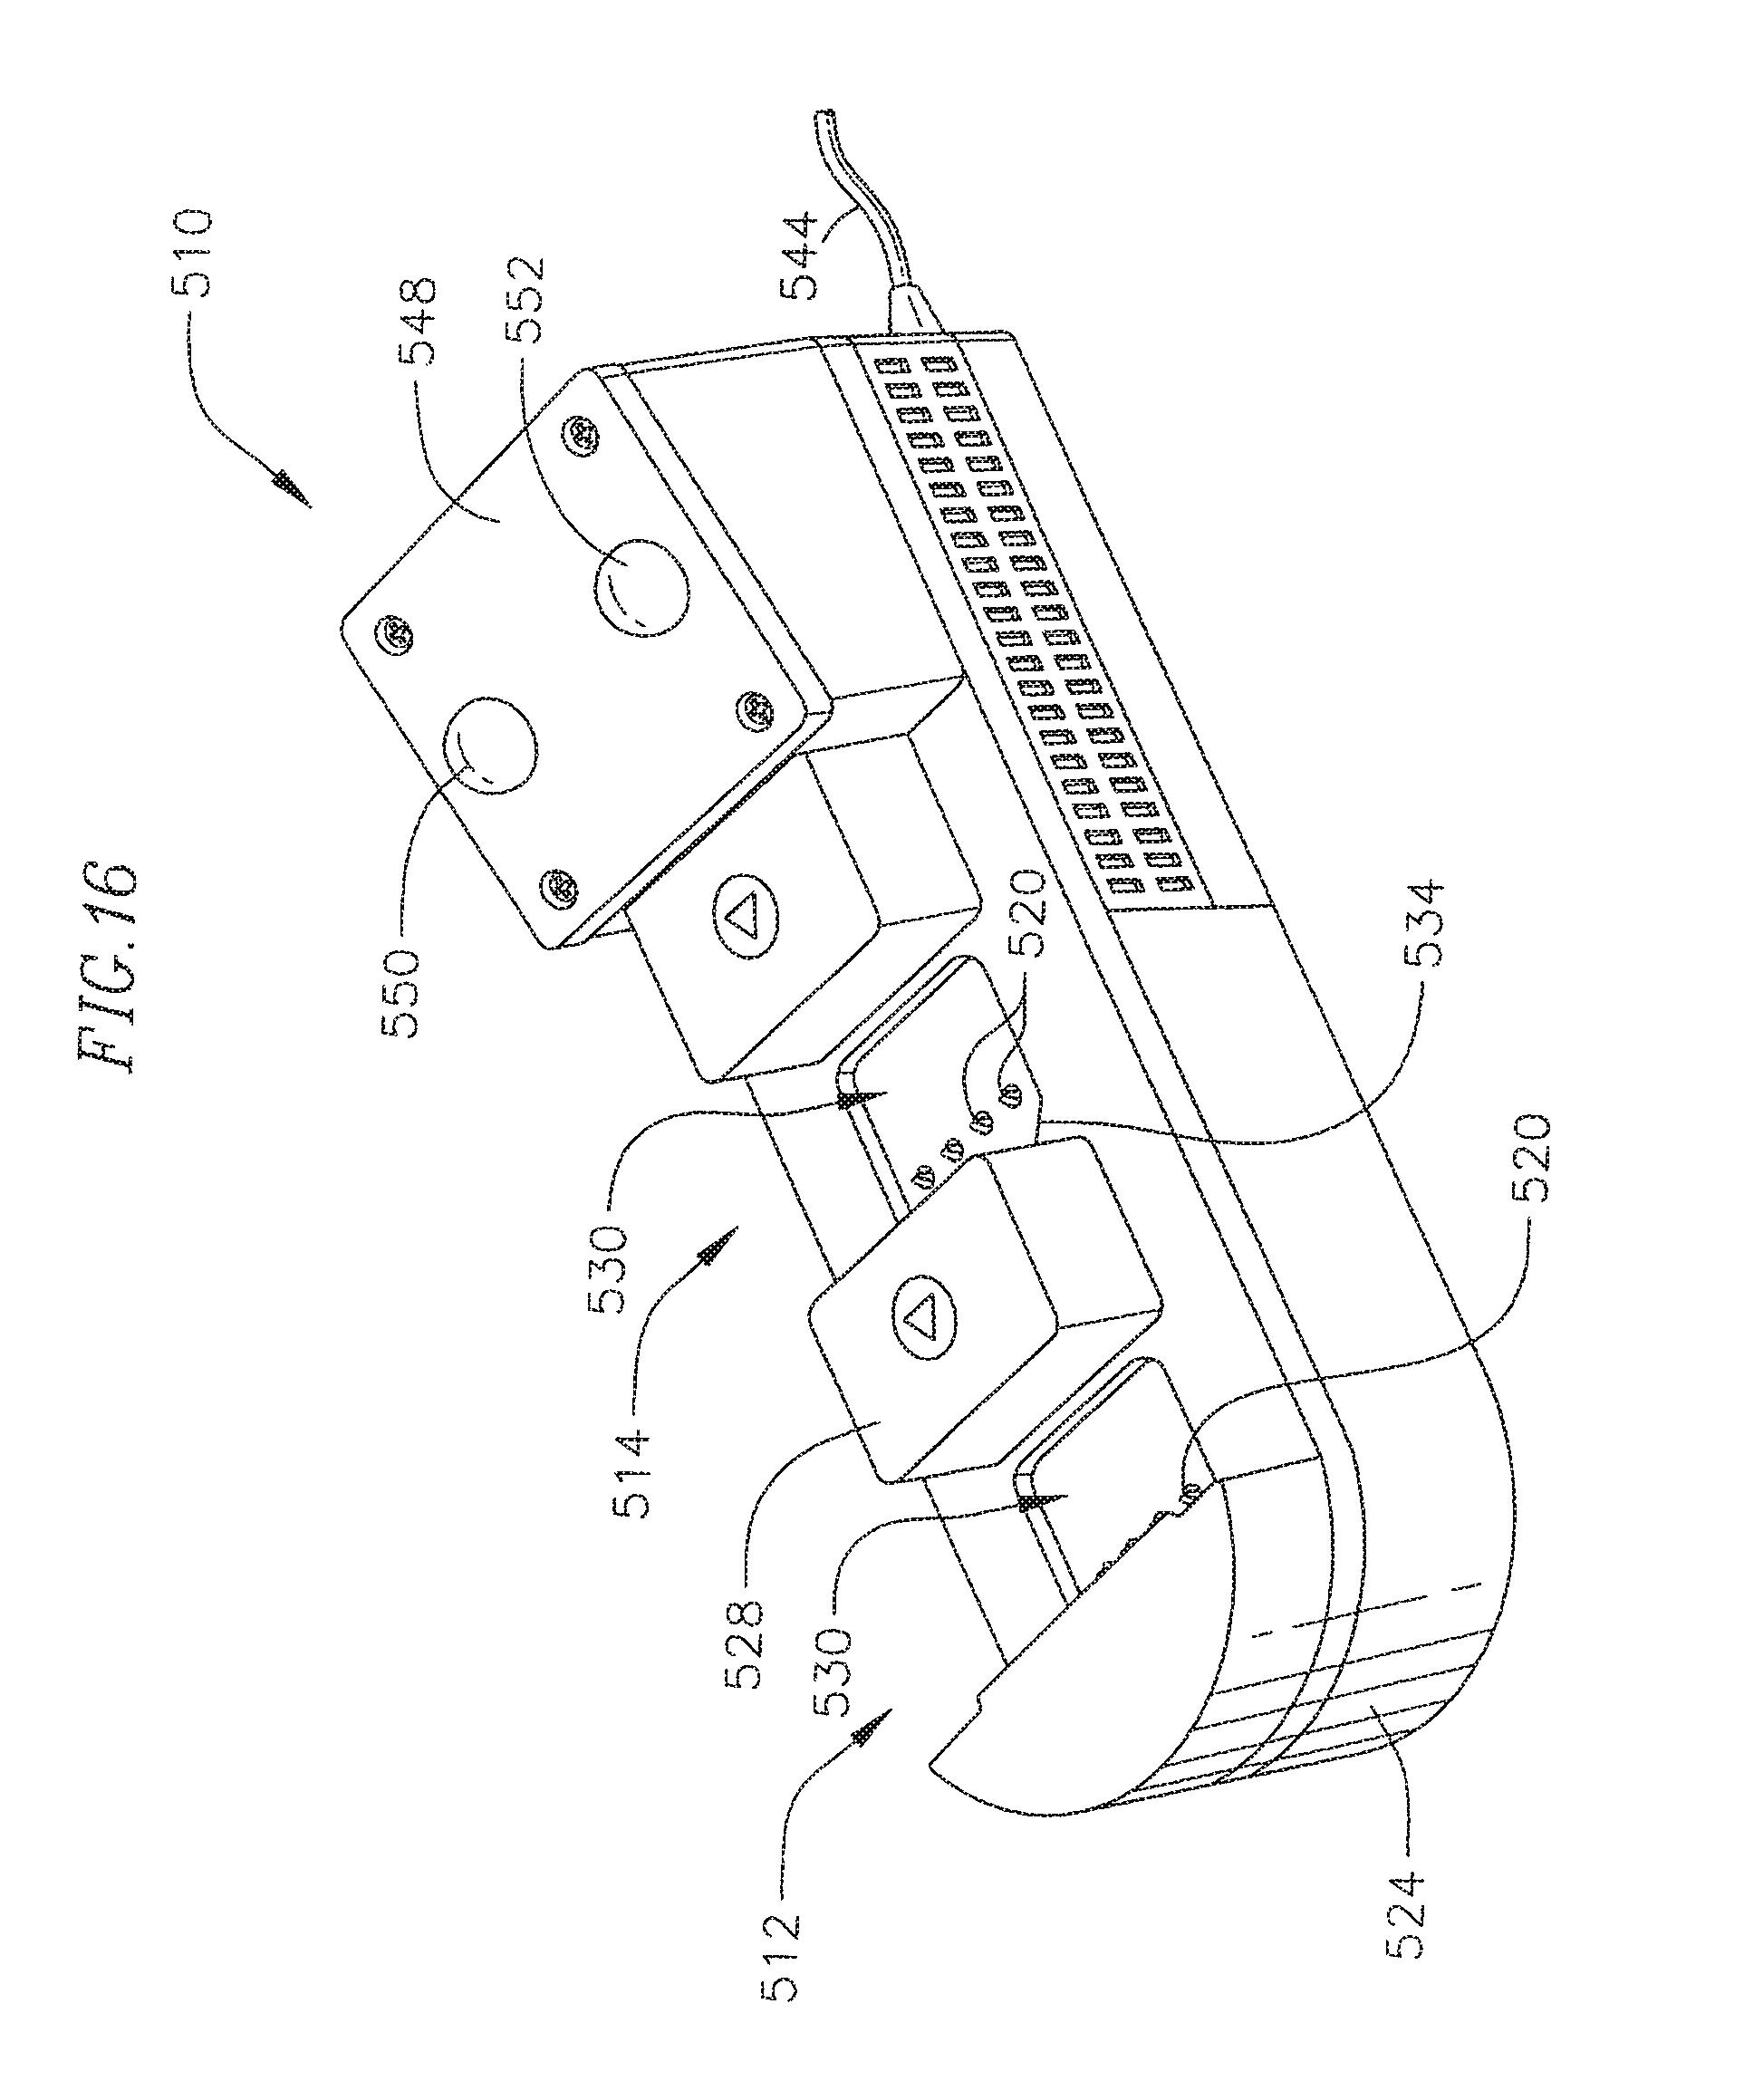 Wiring Diagram Furthermore Rc Esc Wiring Diagram On Brushless Esc